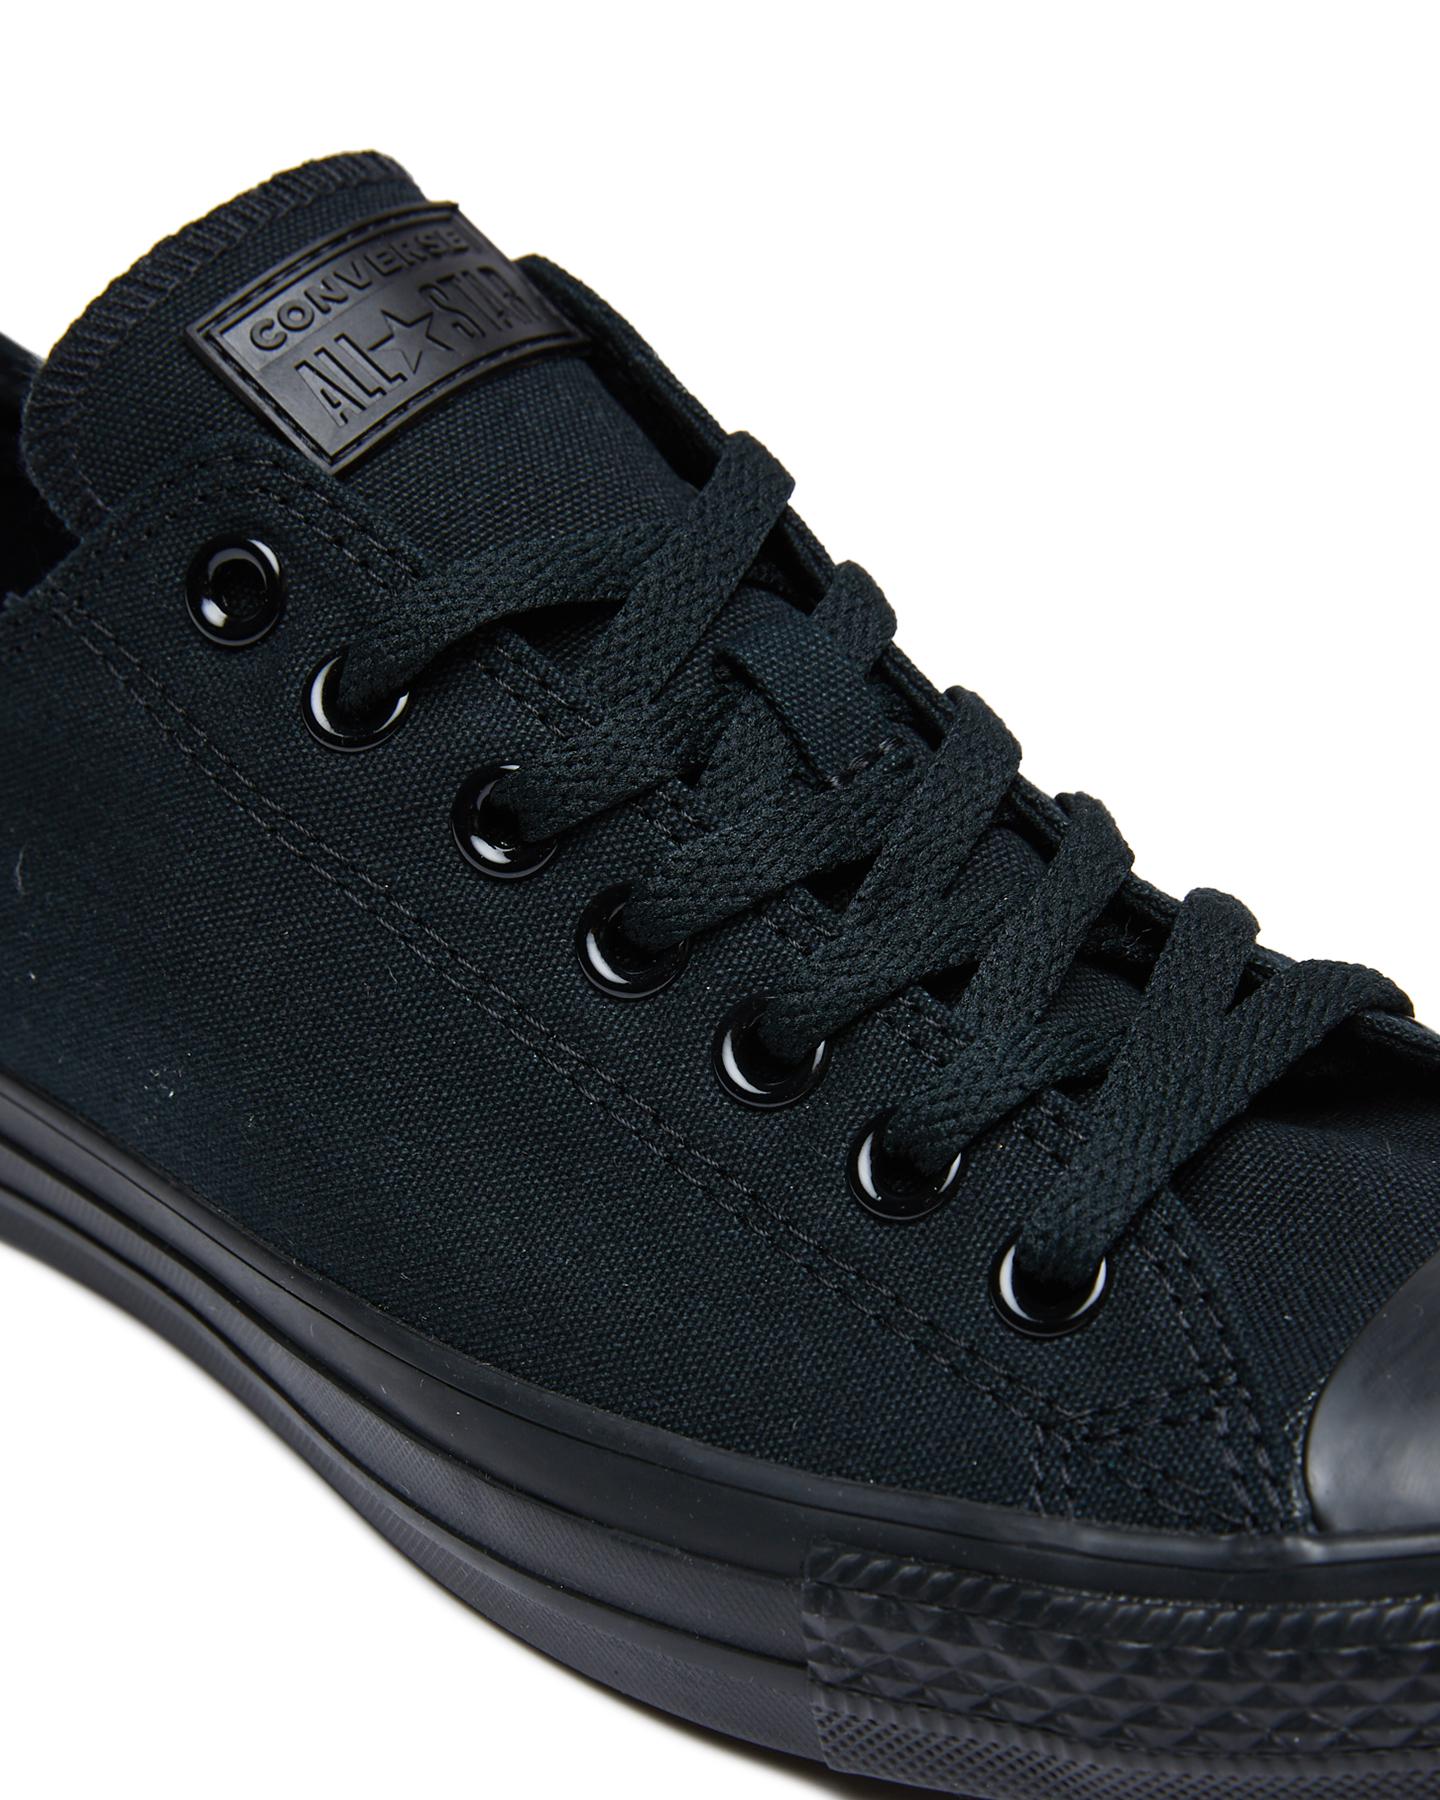 b53e32fdba6f ... BLACK MONOCHROME MENS FOOTWEAR CONVERSE SNEAKERS - SS15039BLKMOM ...